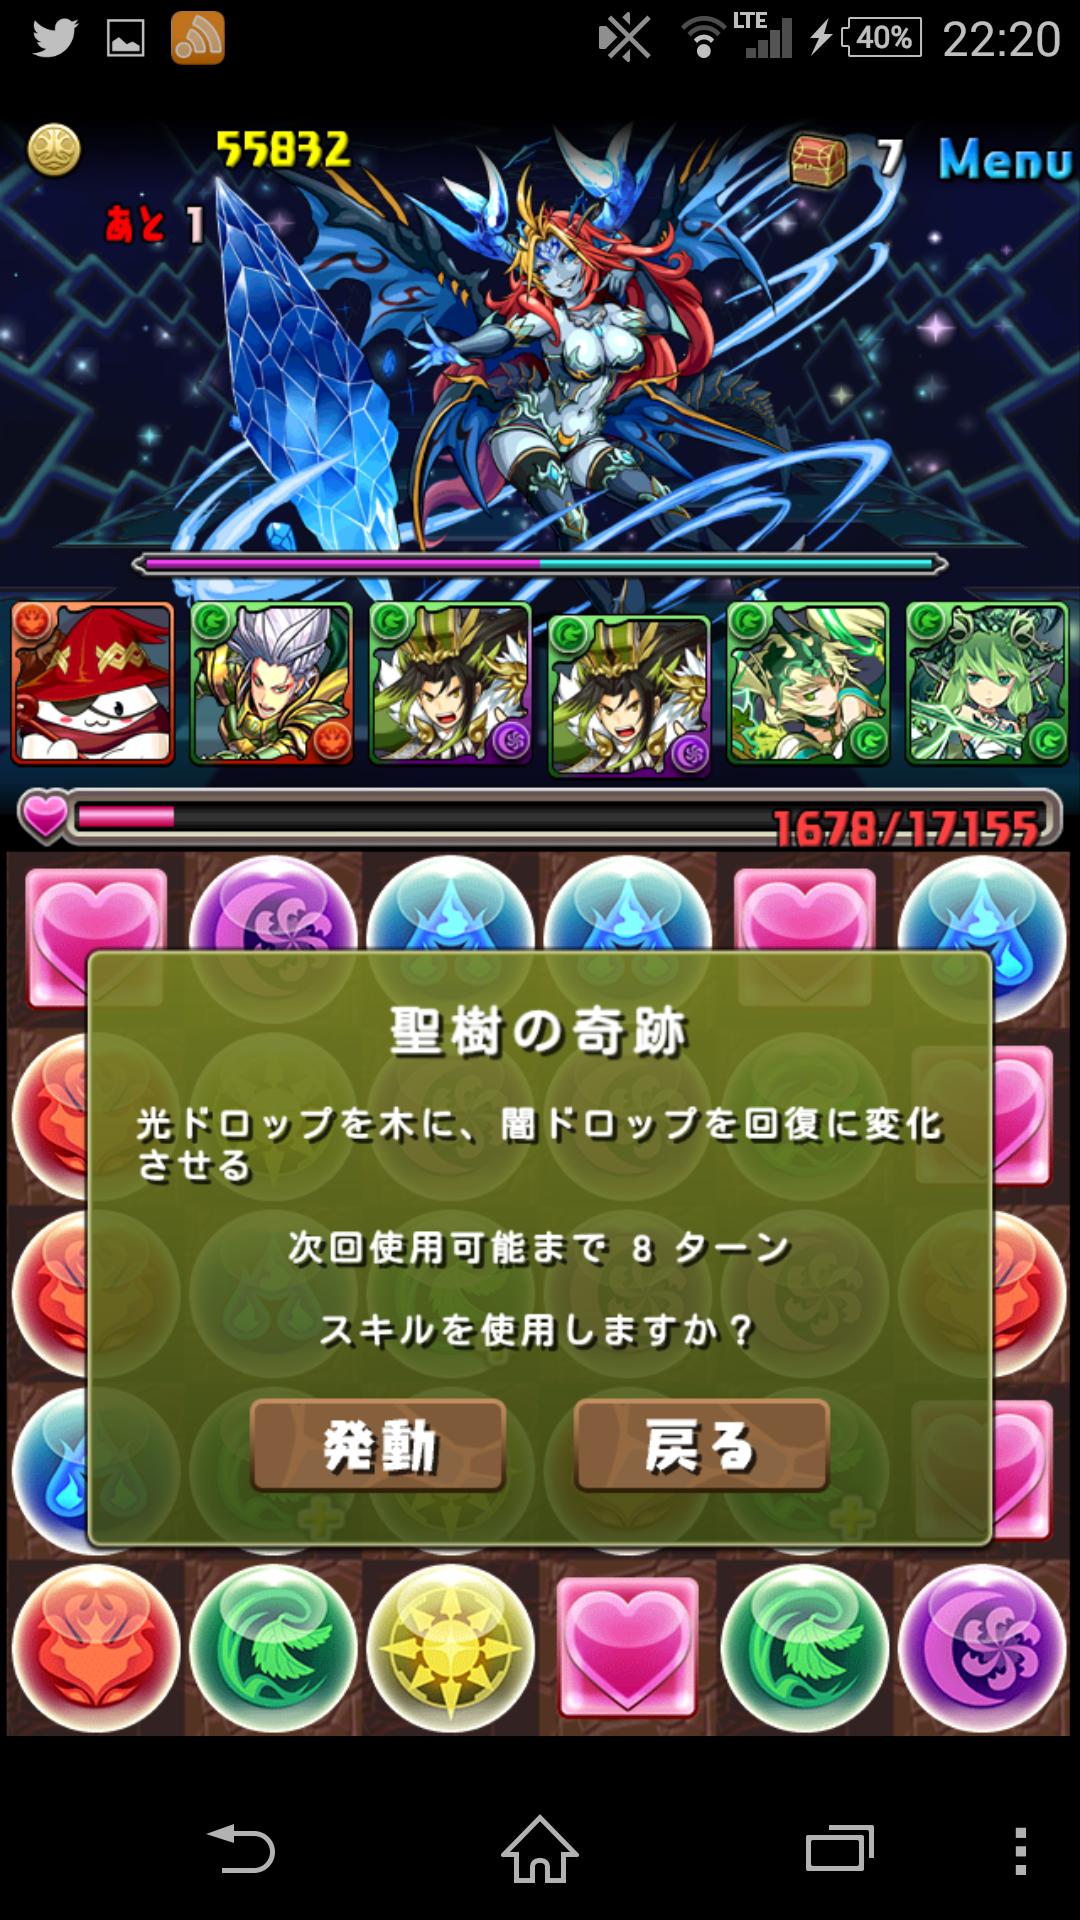 Screenshot_2015-02-20-22-20-41.png